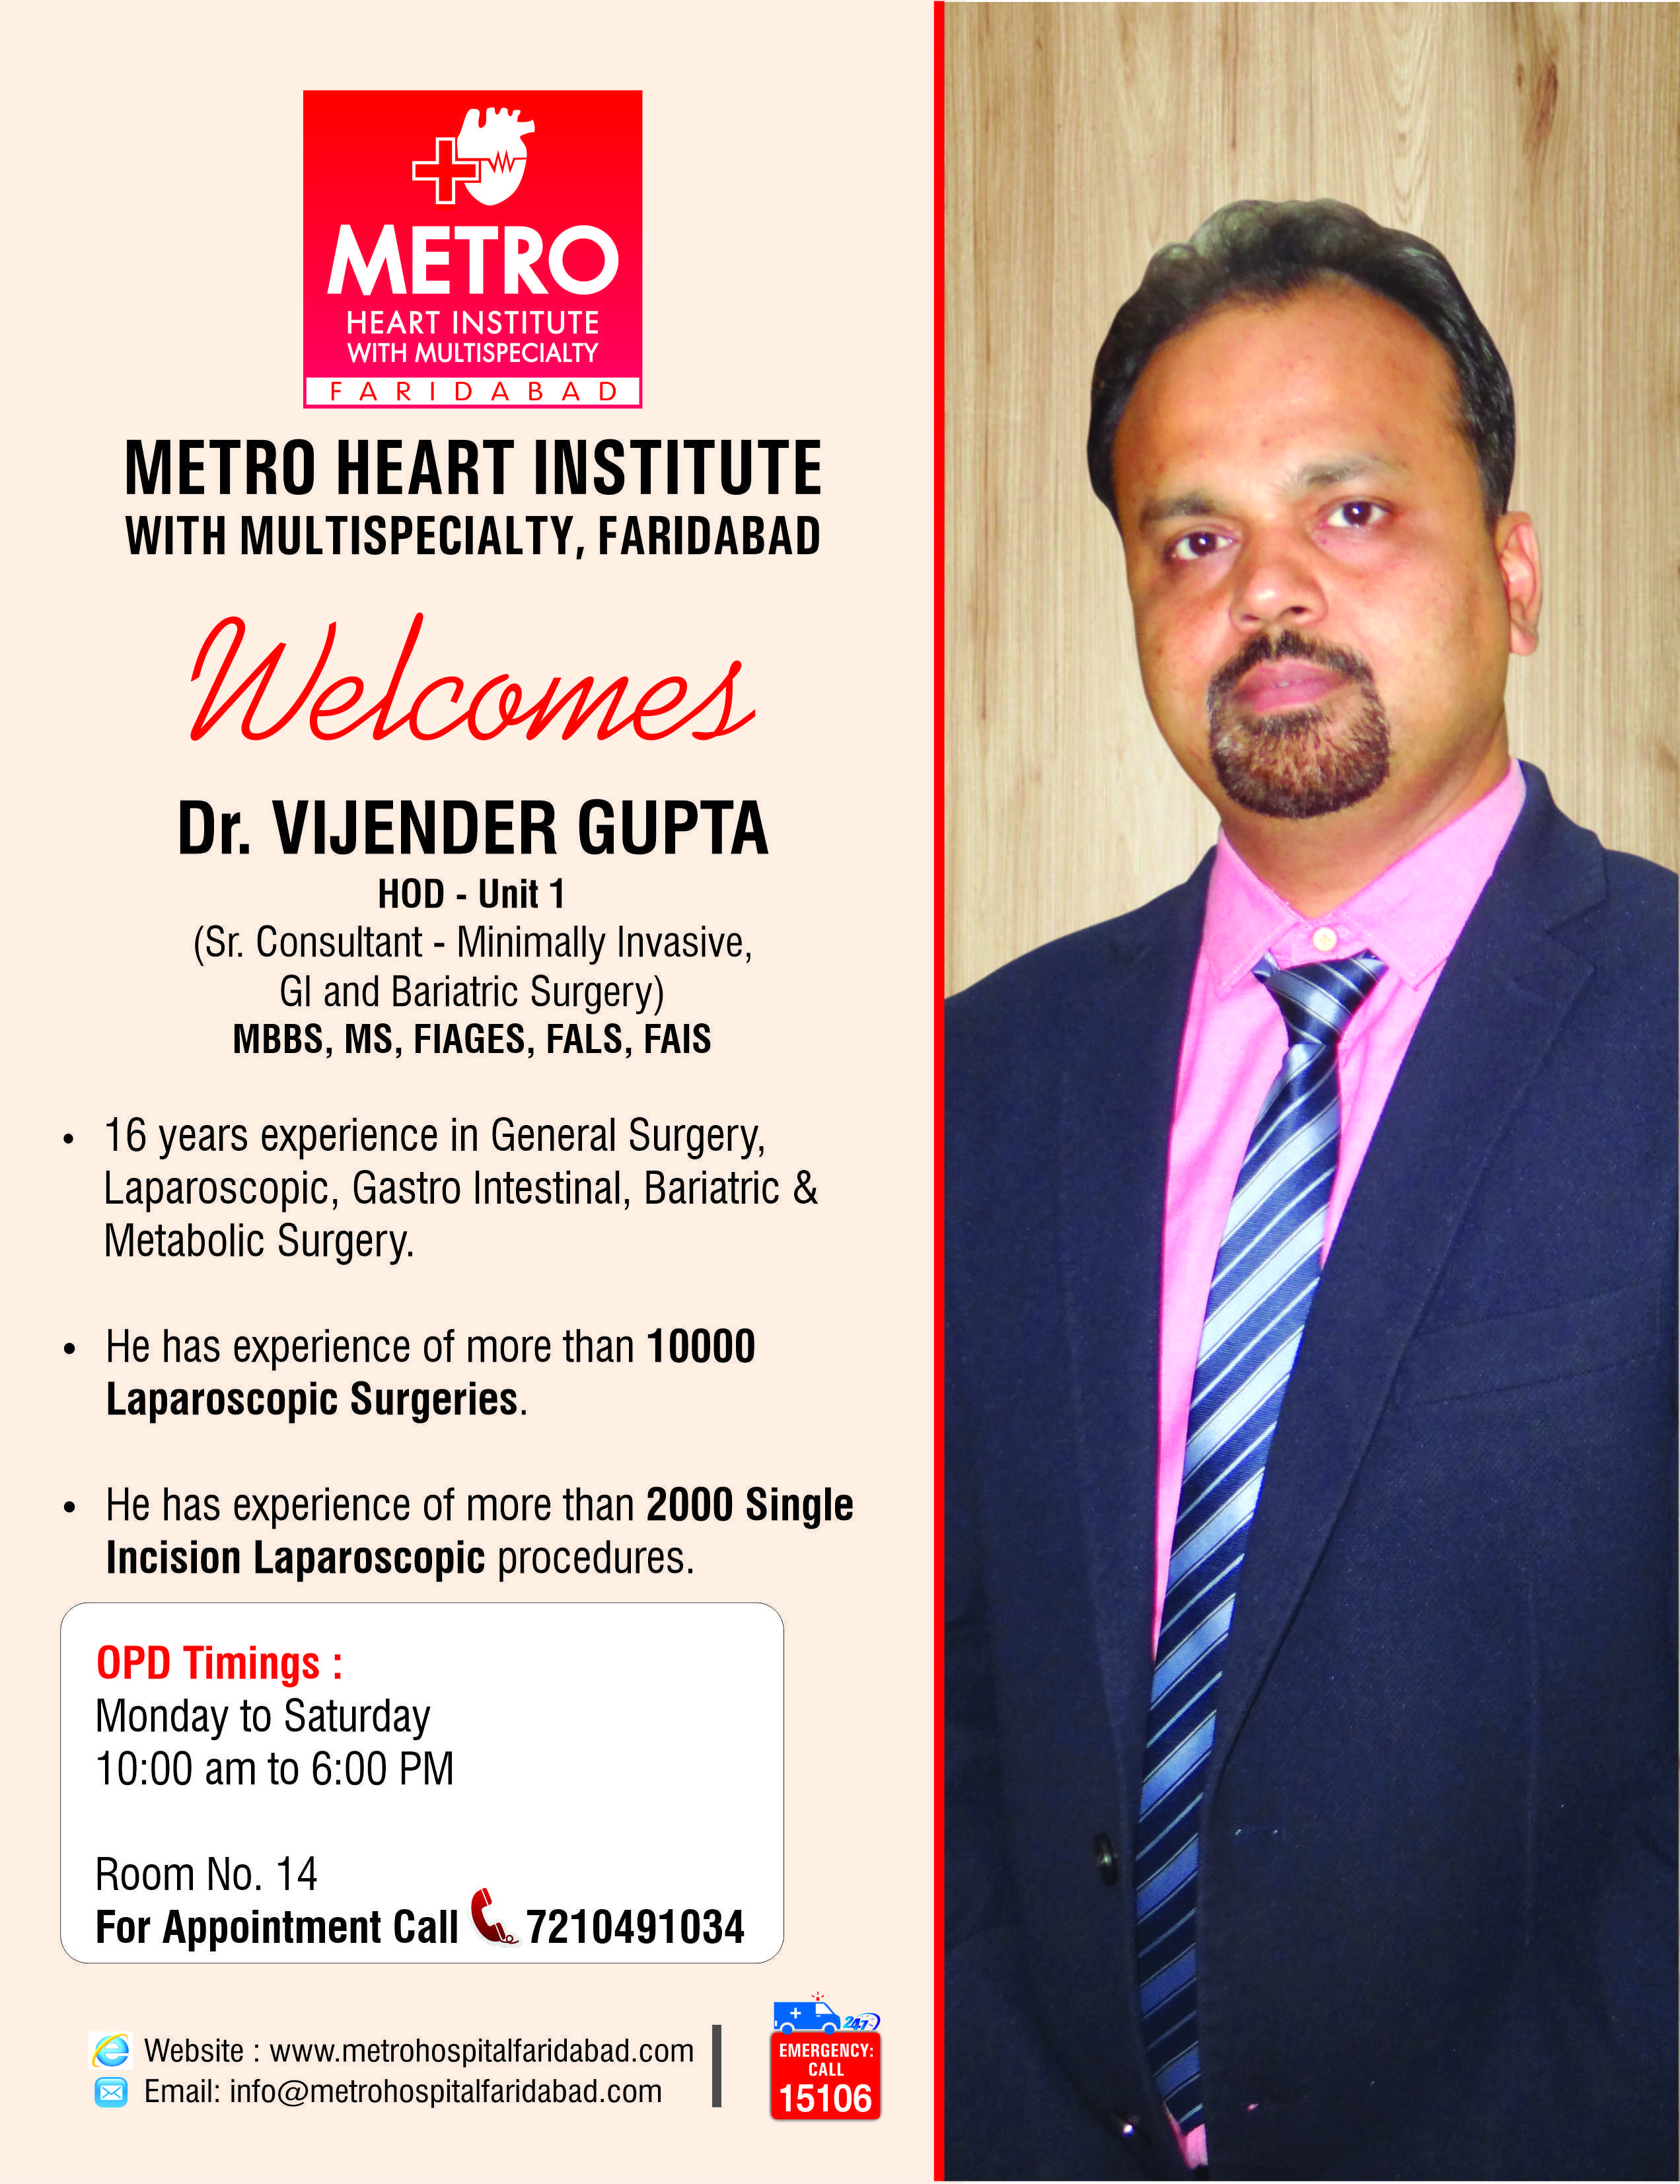 MetroHospitalFaridabad laparoscopic_surgeon bariatric